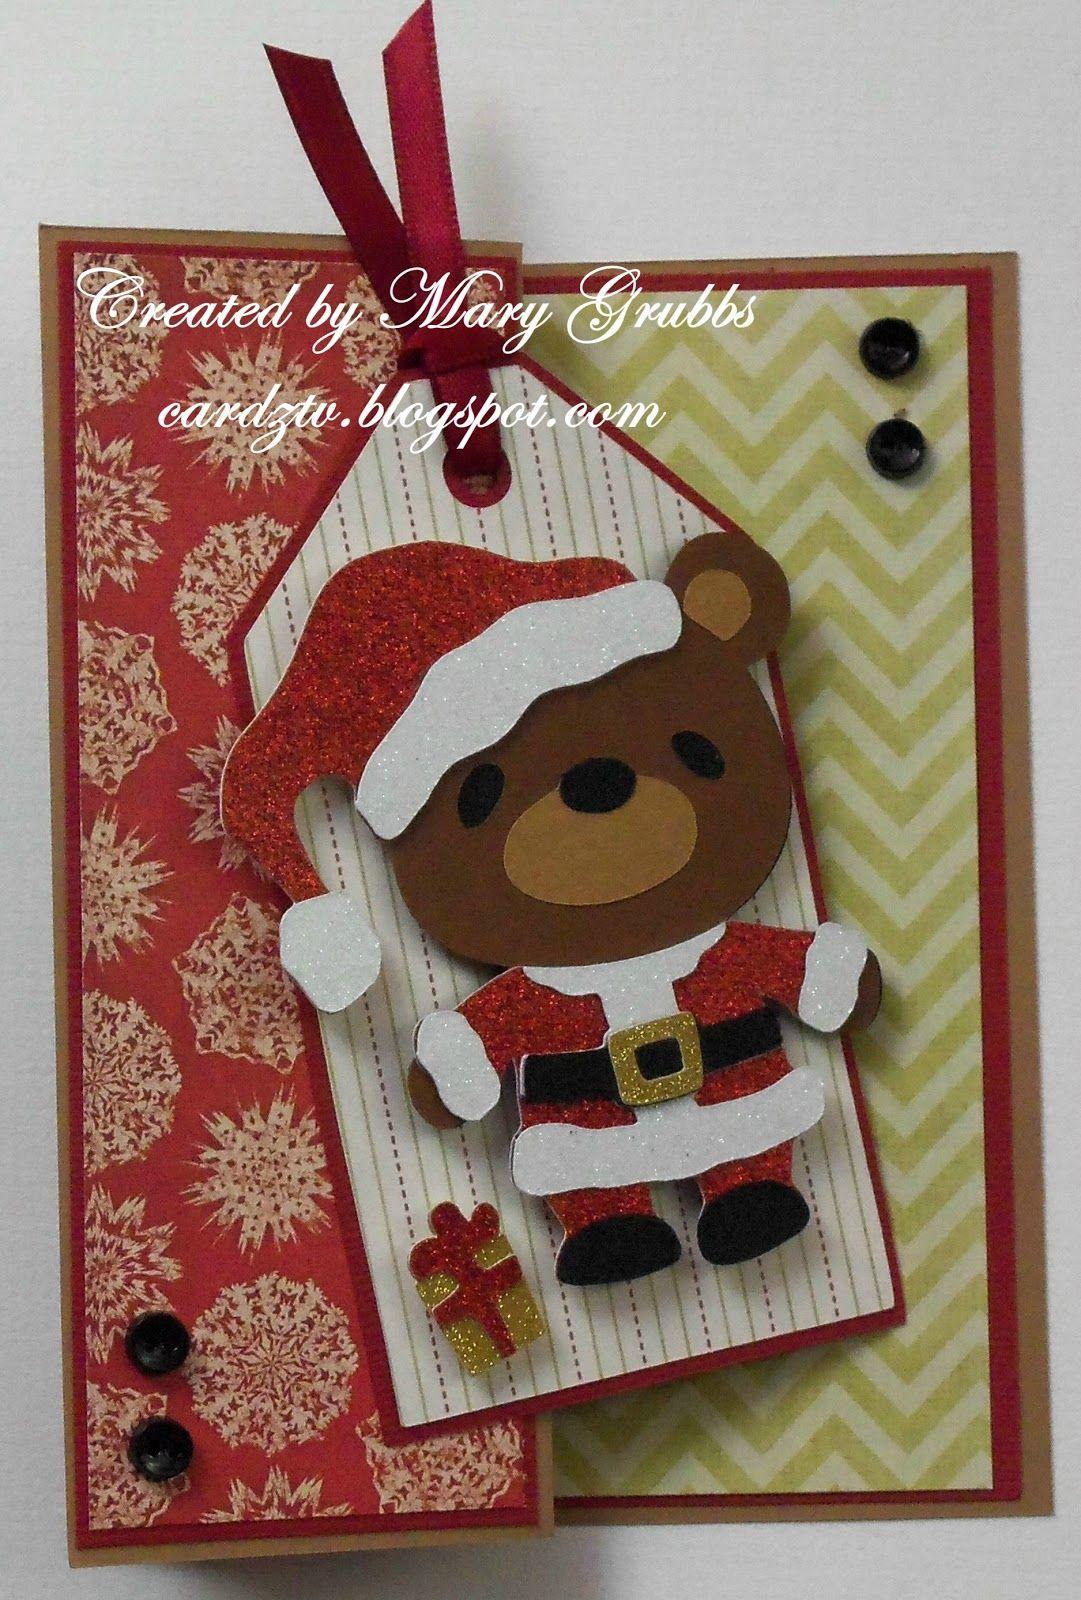 Cricut Card Making Ideas Youtube Part - 36: CARDZ TV: CARDZ TV CARD GALLERY. Great Inspiration For Everything.  Christmas TagCricut Christmas CardsXmas ...